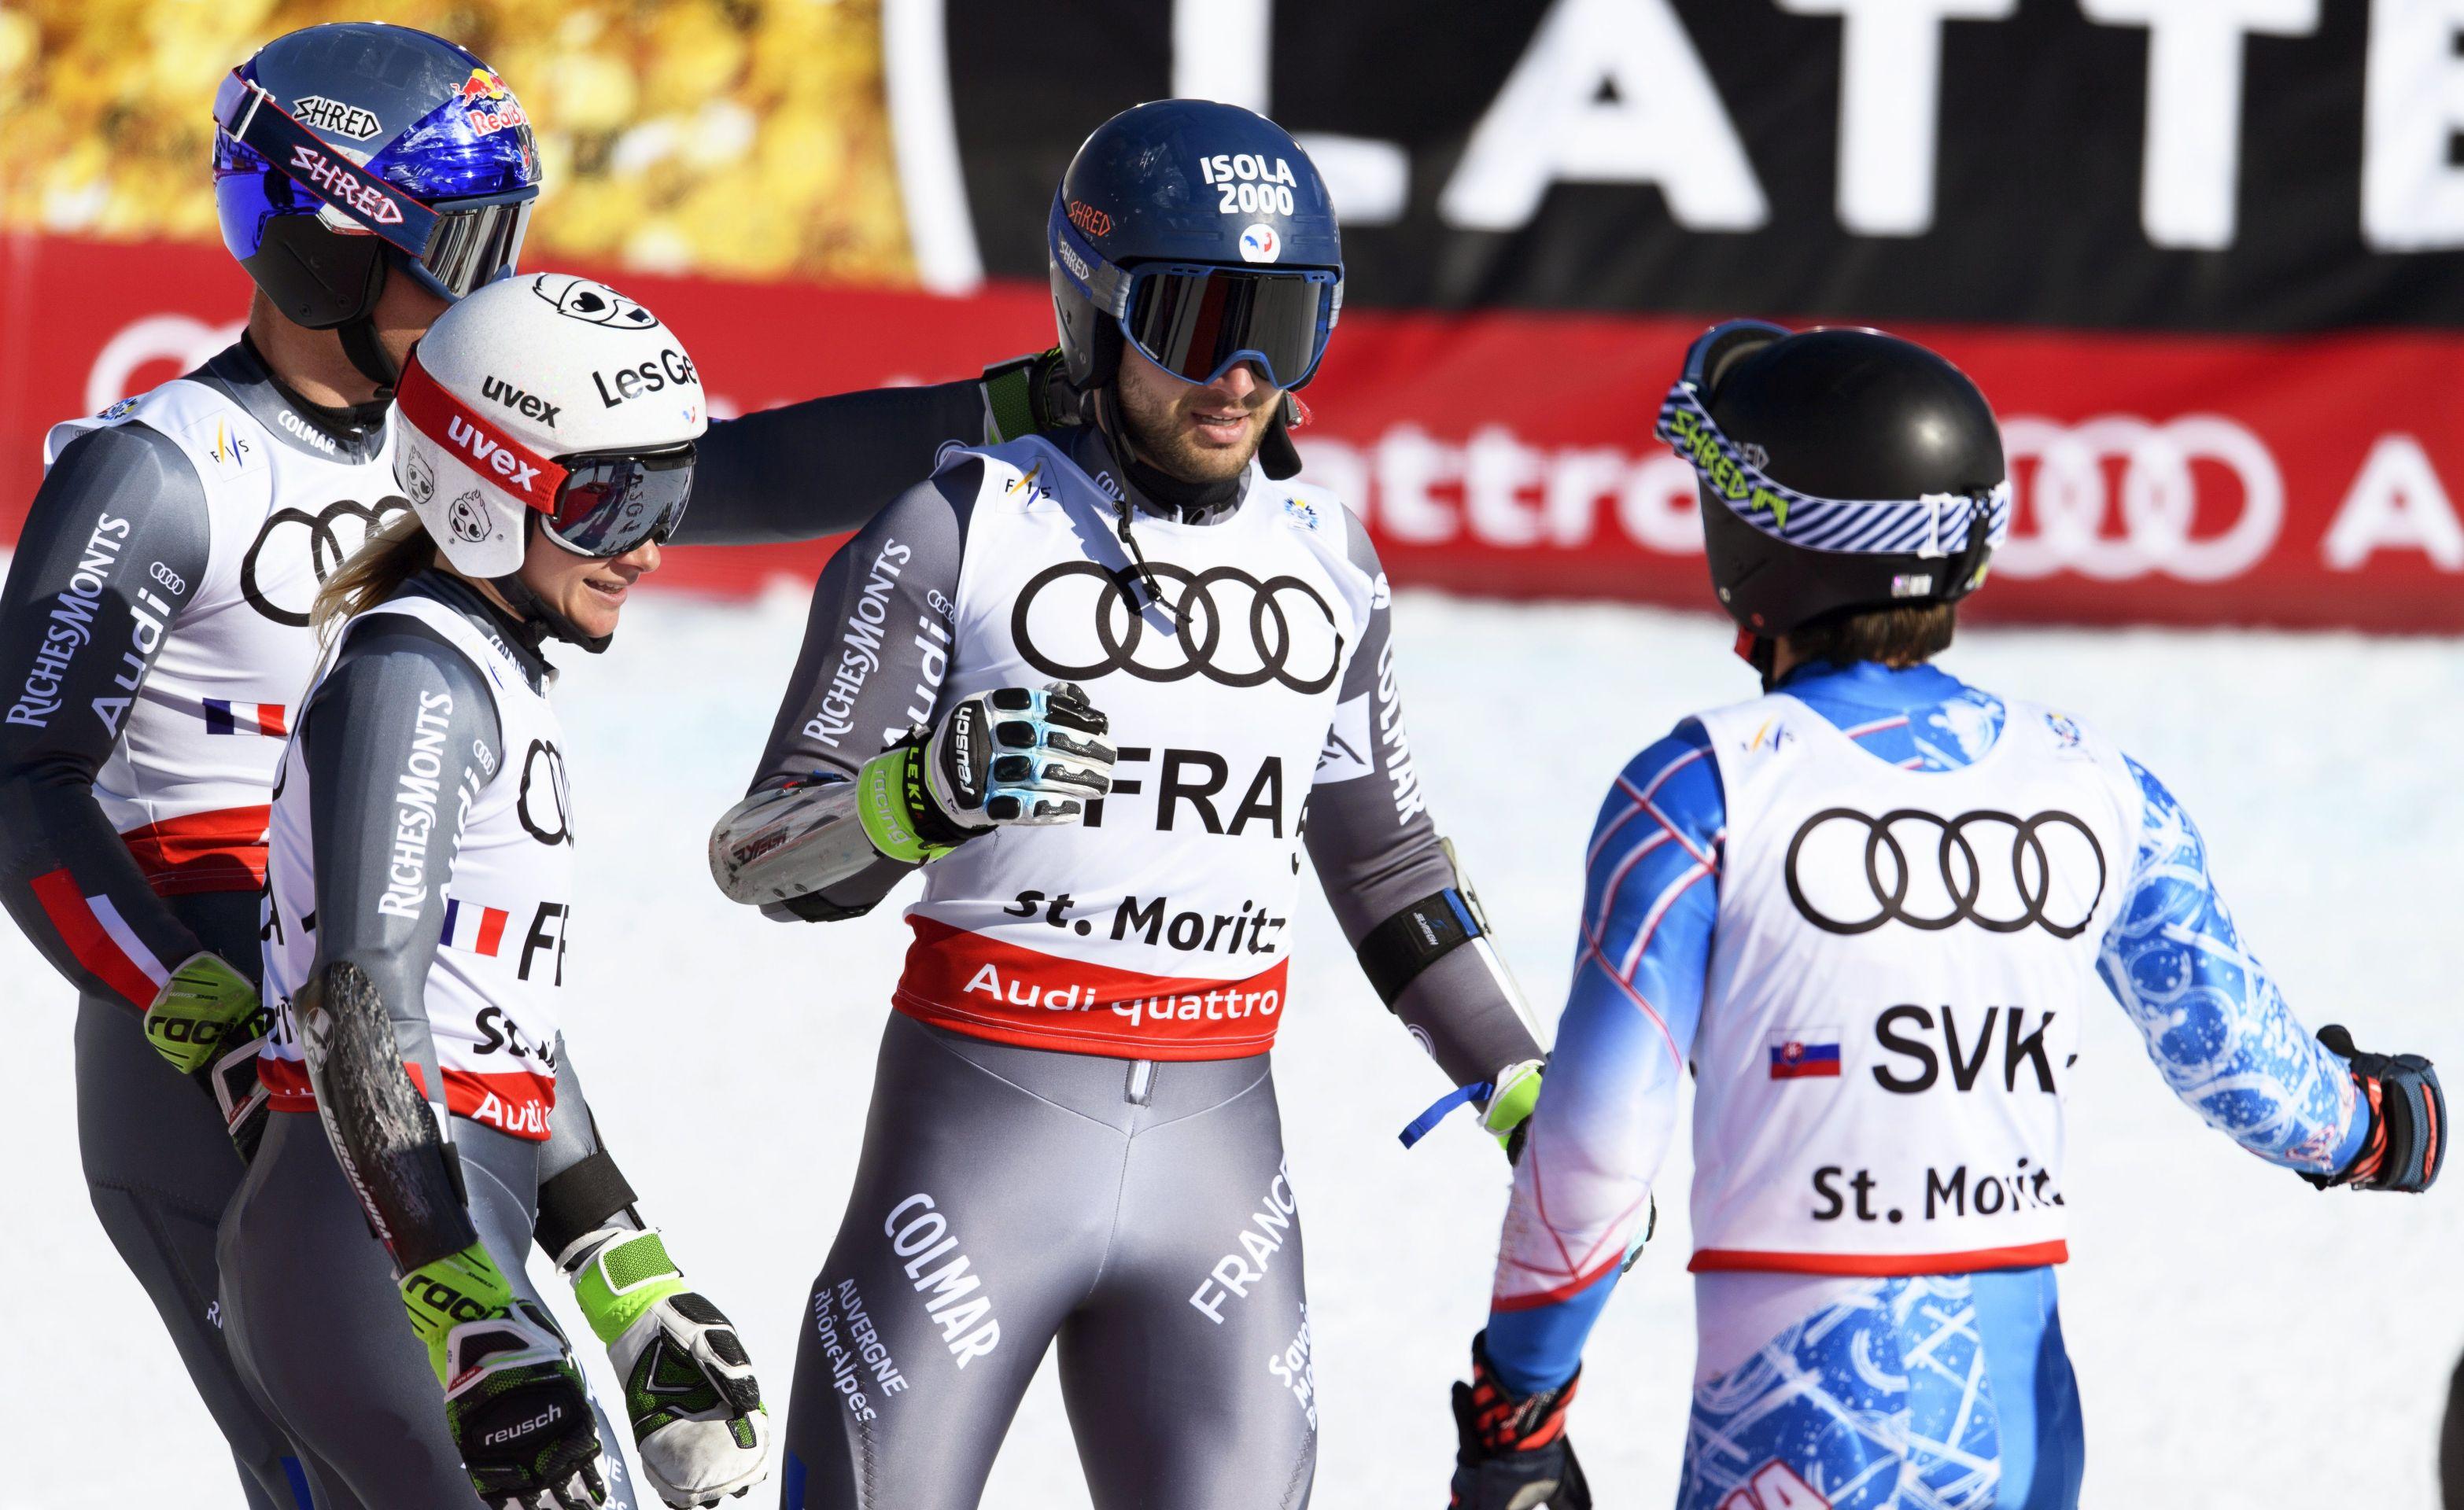 SP, SKIJANJE Francuska zlatna u paralelnom slalomu